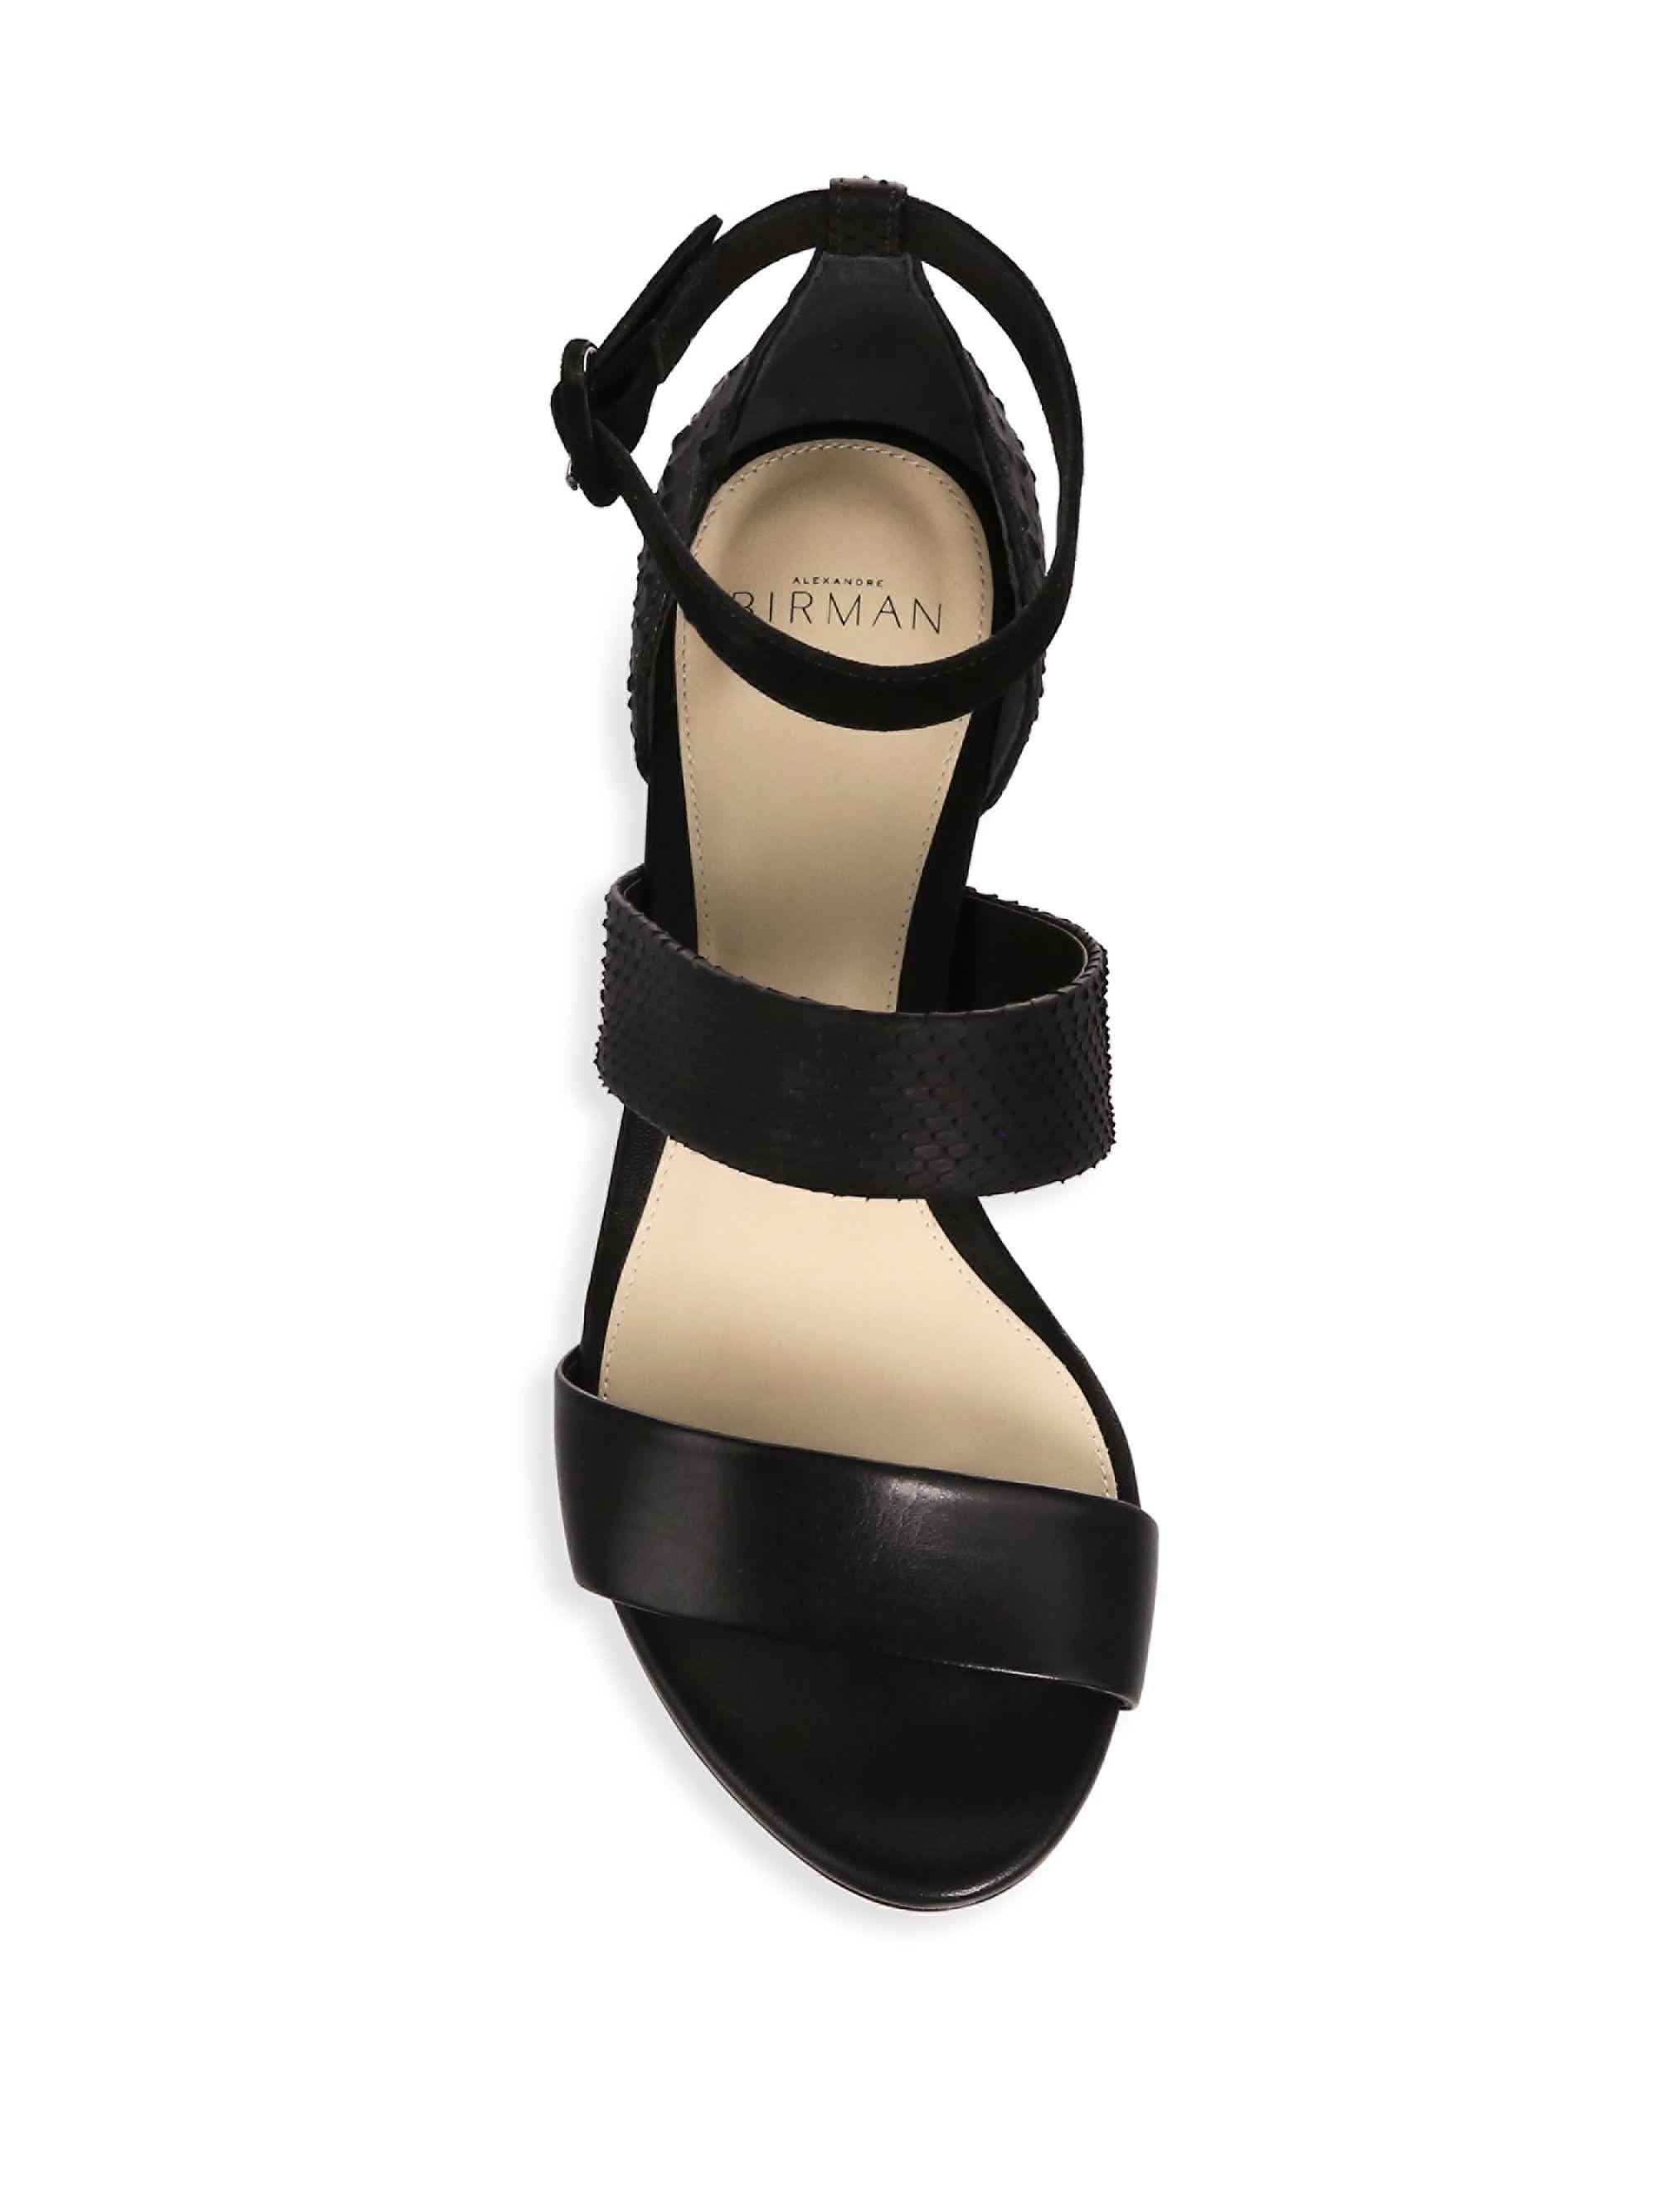 485e232314a ALEXANDRE BIRMAN New Yanna Python   Leather Platform Sandals.   alexandrebirman  shoes